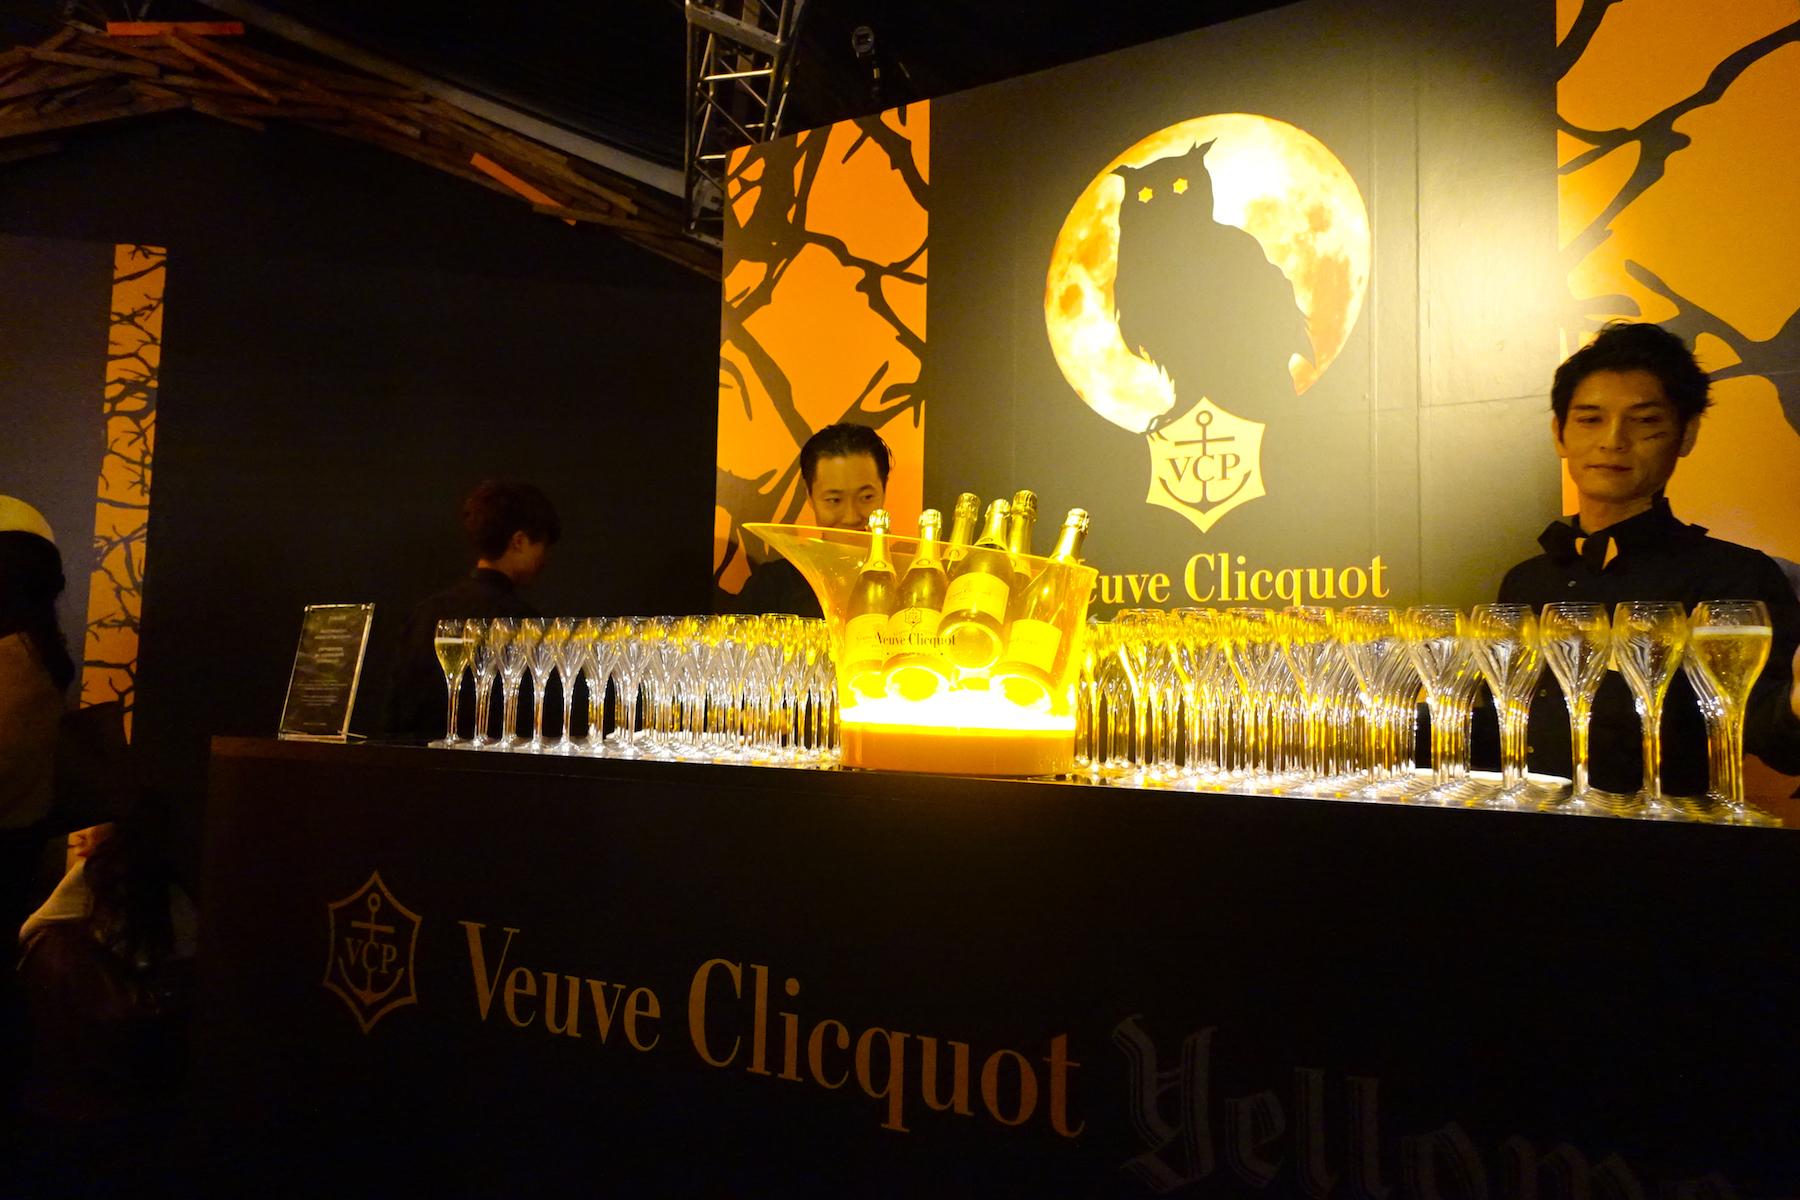 Veuve Clicquot Yelloween_2018_10